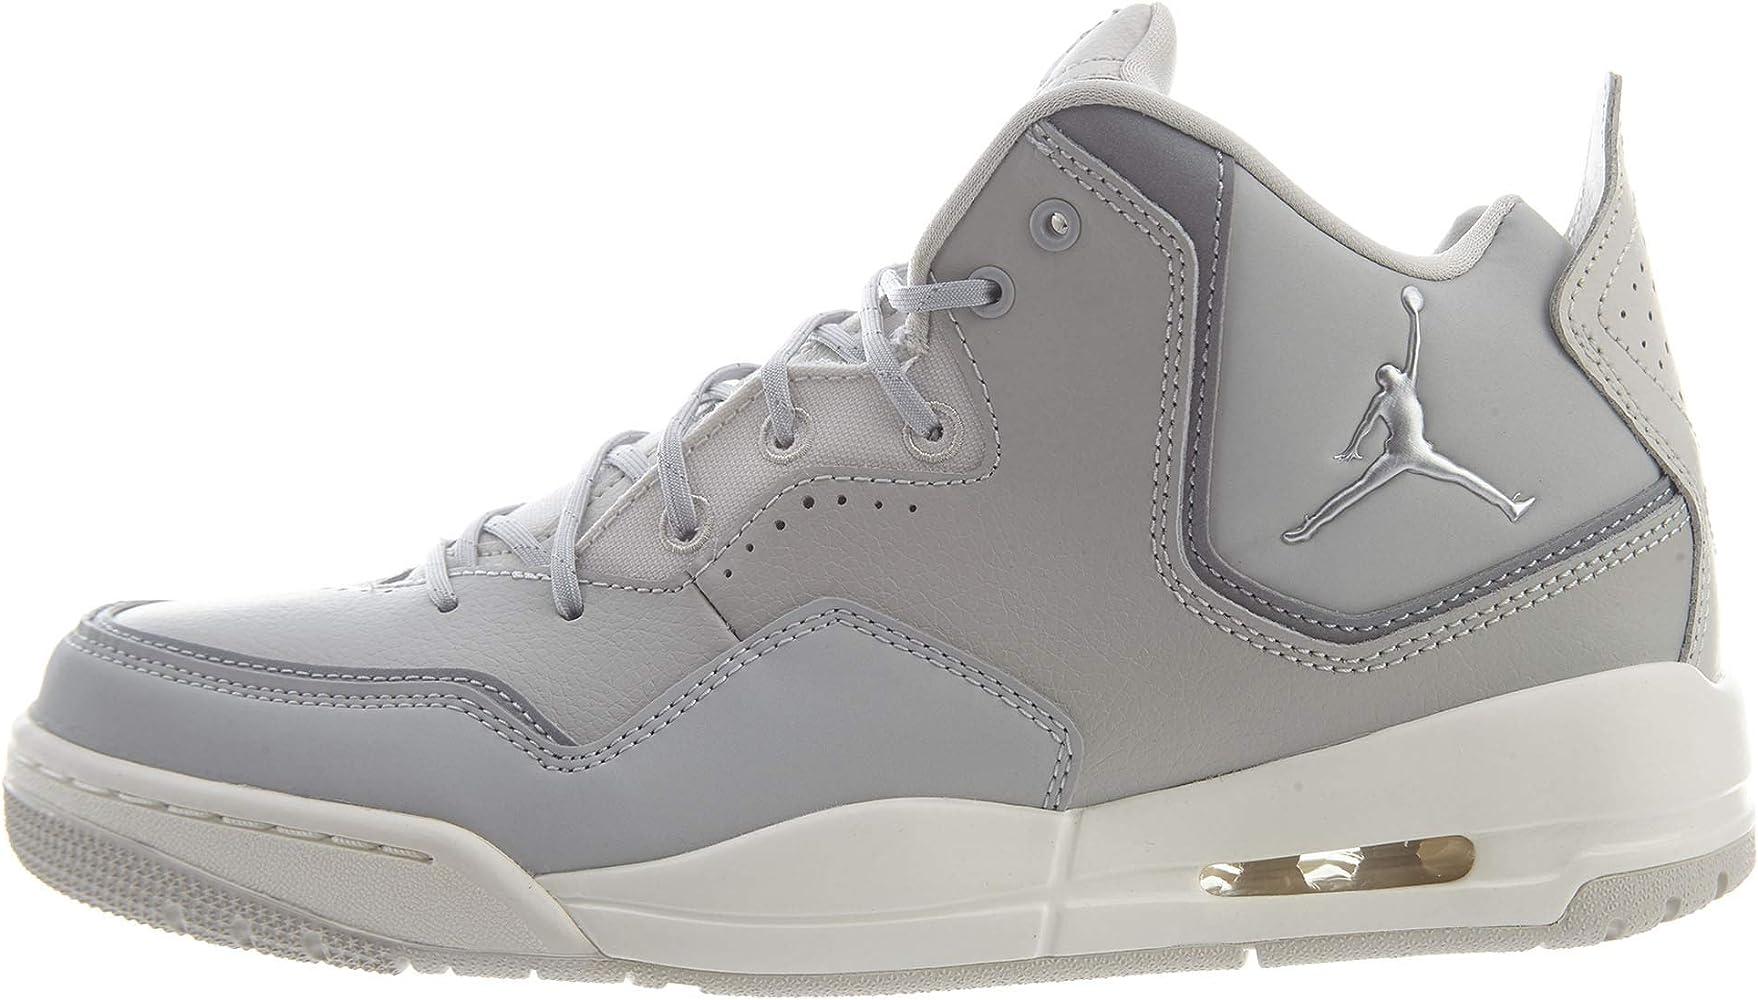 Nike Jordan Men's Jordan Courtside 23